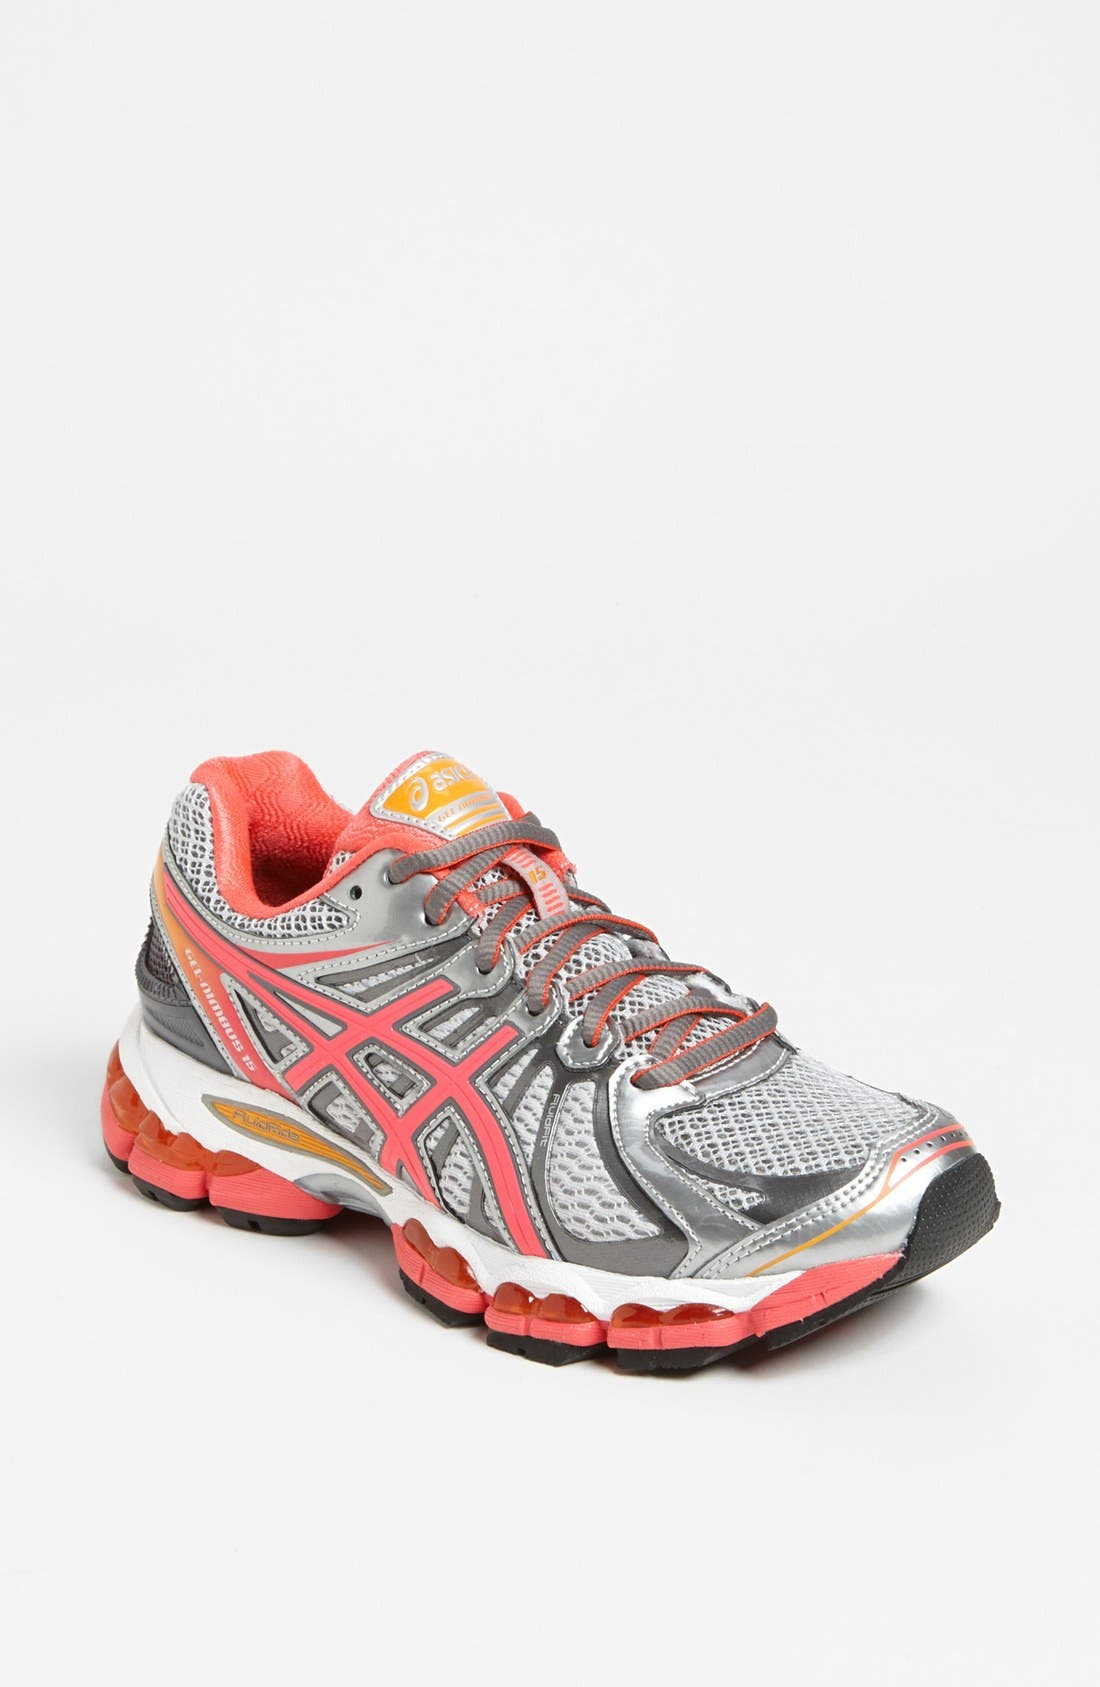 Alternate Image 1 Selected - ASICS® 'GEL-Nimbus 15' Running Shoe (Women)